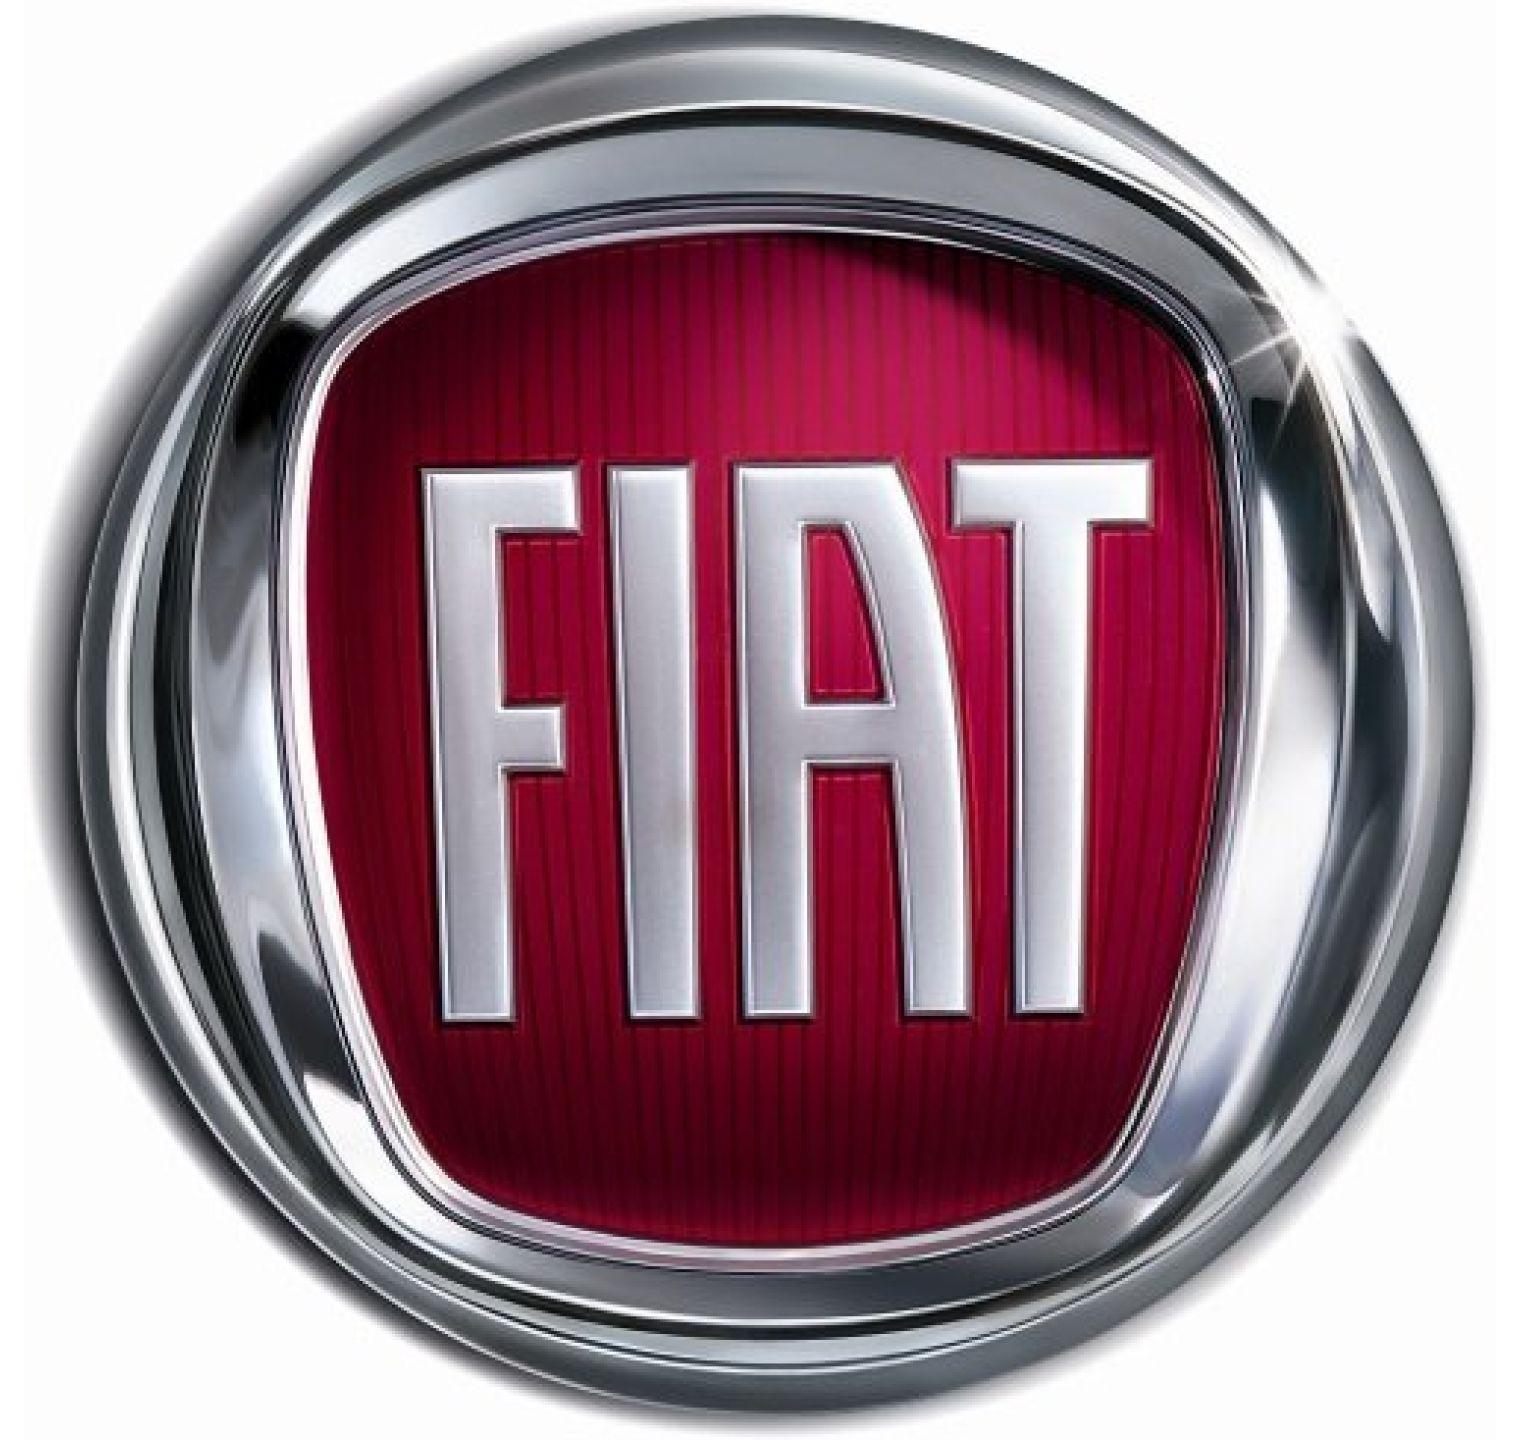 Fiat Idea (vanaf 2004) - achterruitenwisser Valeo Standard